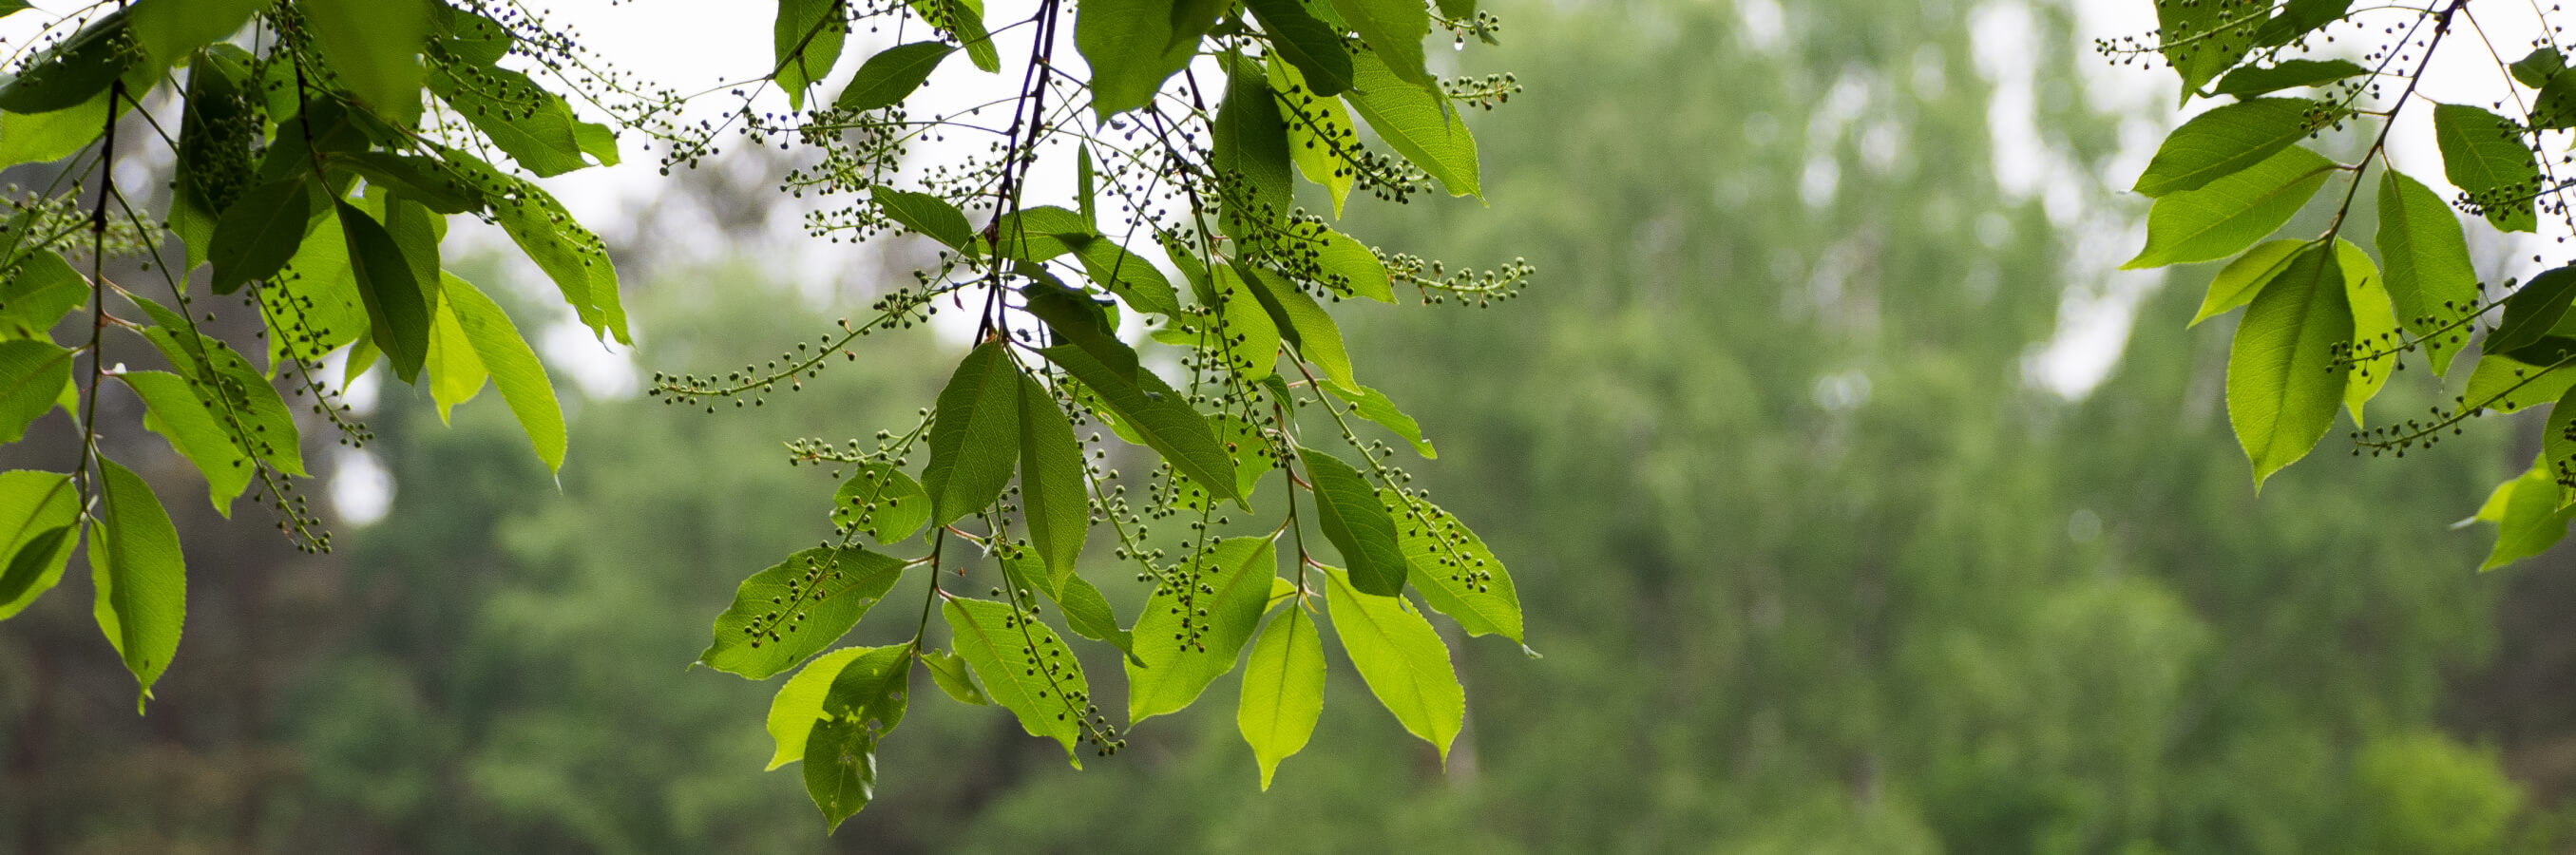 Heide Bussum bladeren nabij locatie mindfulnesstraining